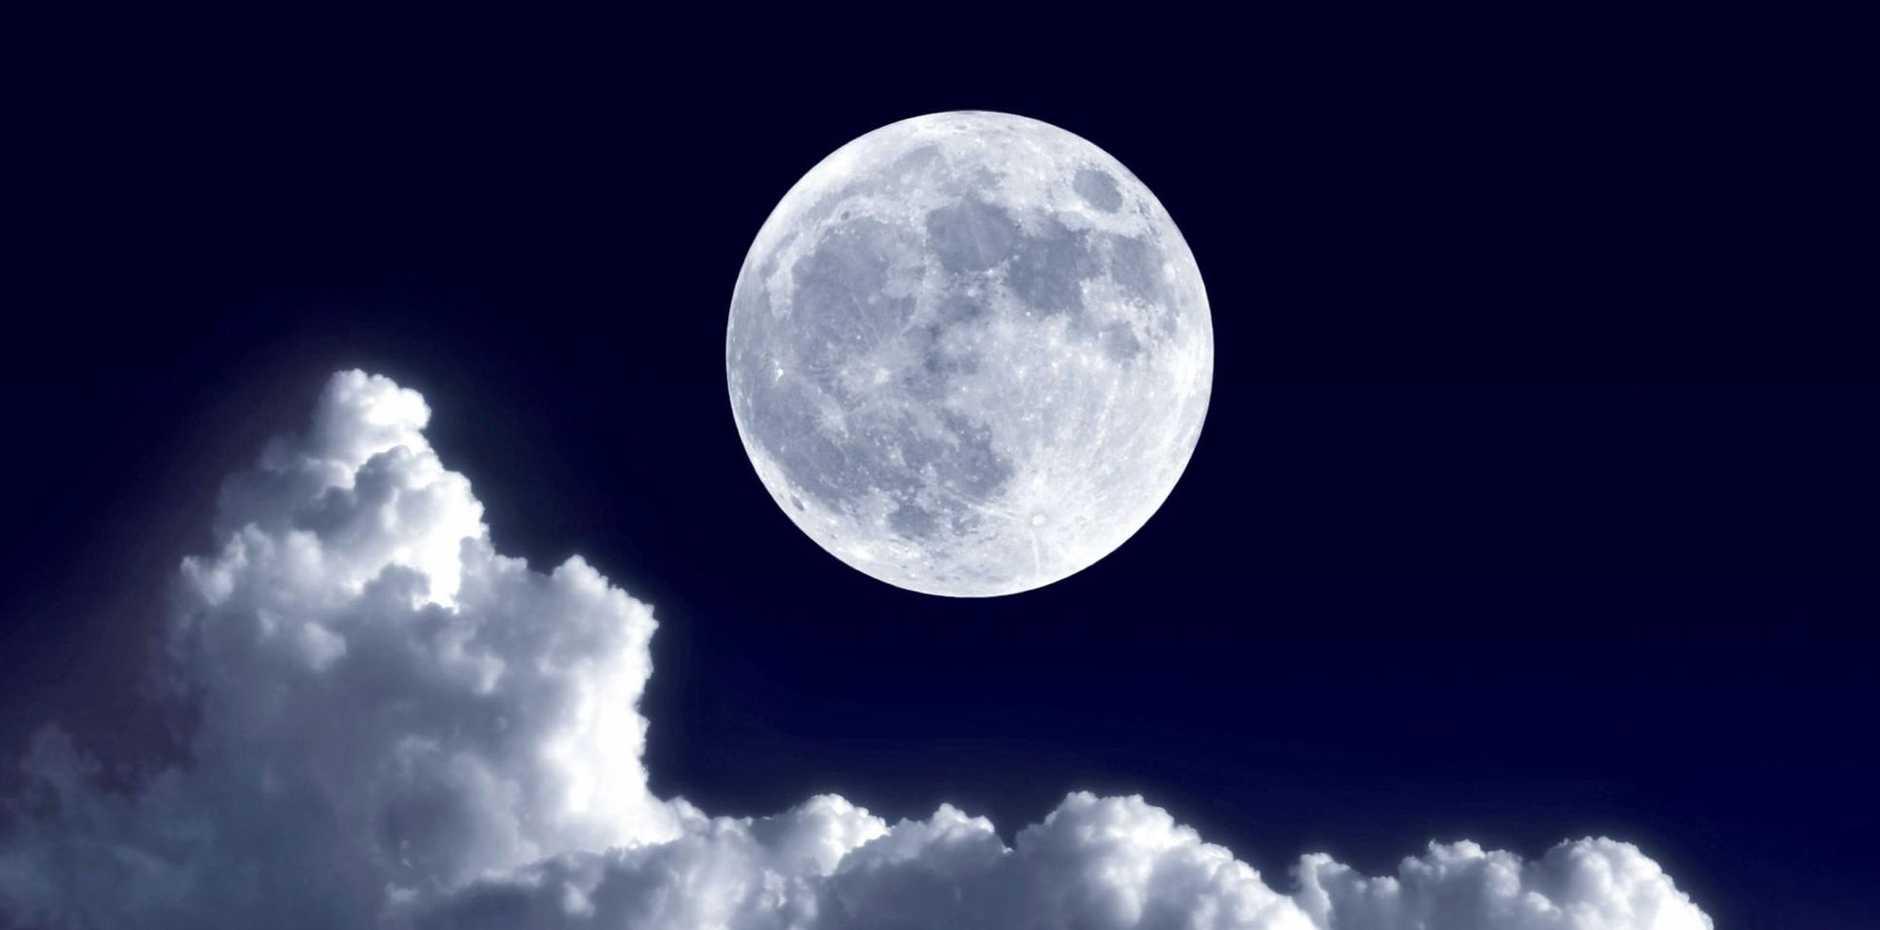 TELESCOPES READY: An 'extra supermoon' will appear in the night sky on November 15.